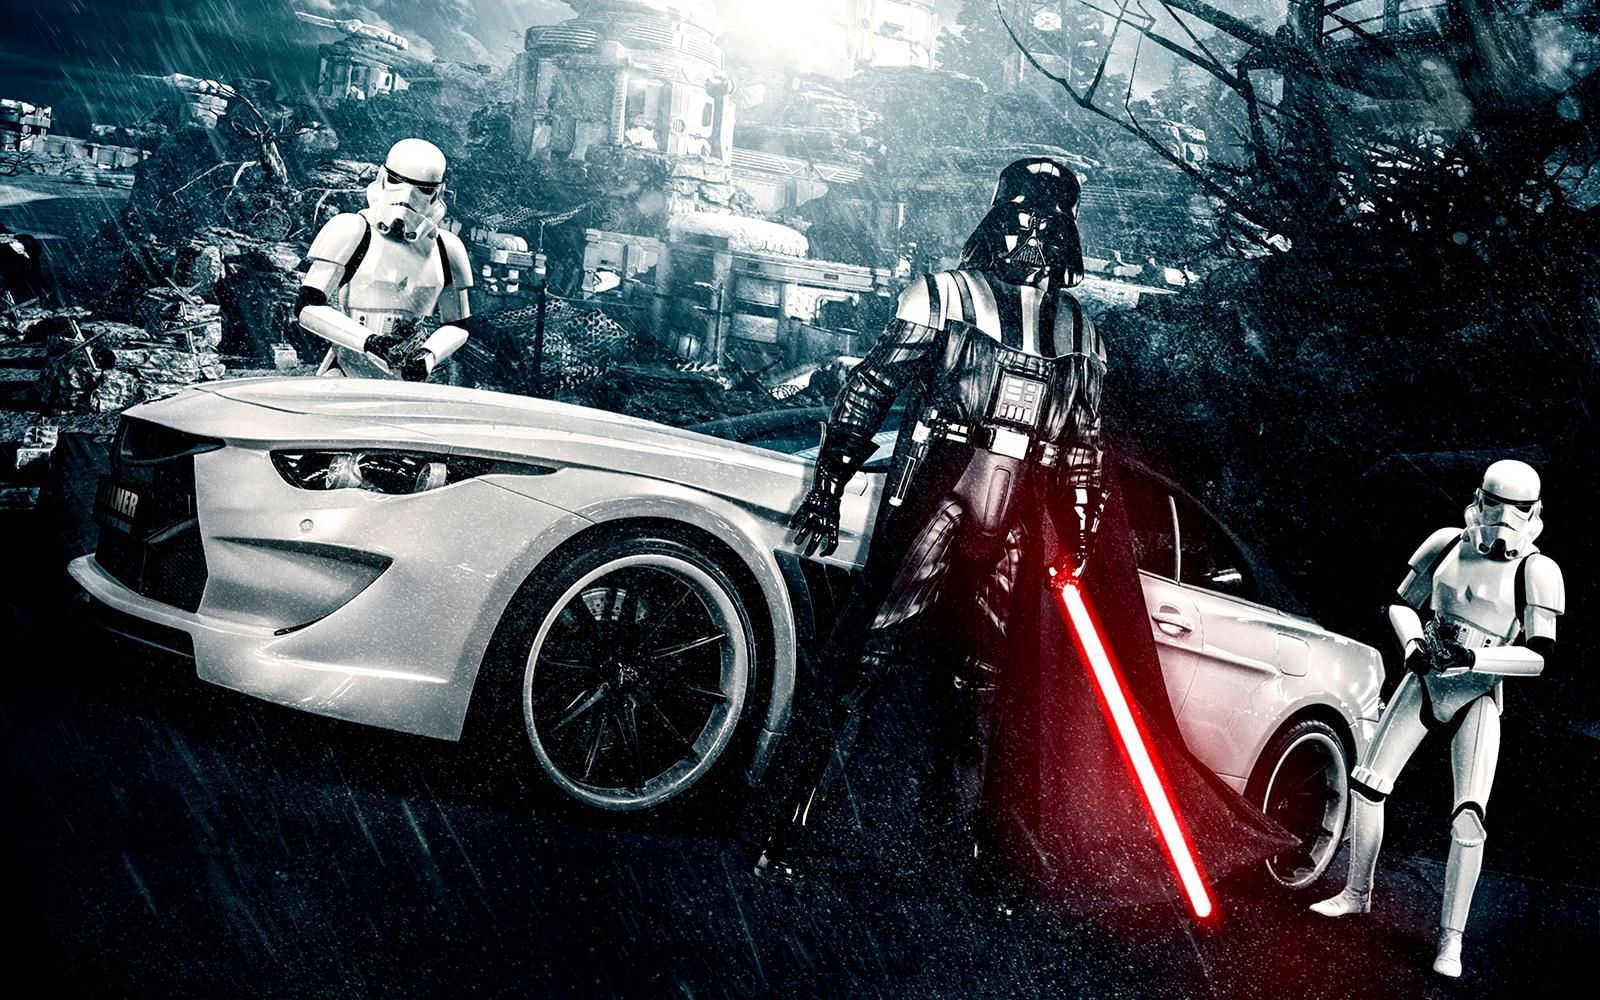 Star Wars Vehicles Wallpapers Wallpaper Cave